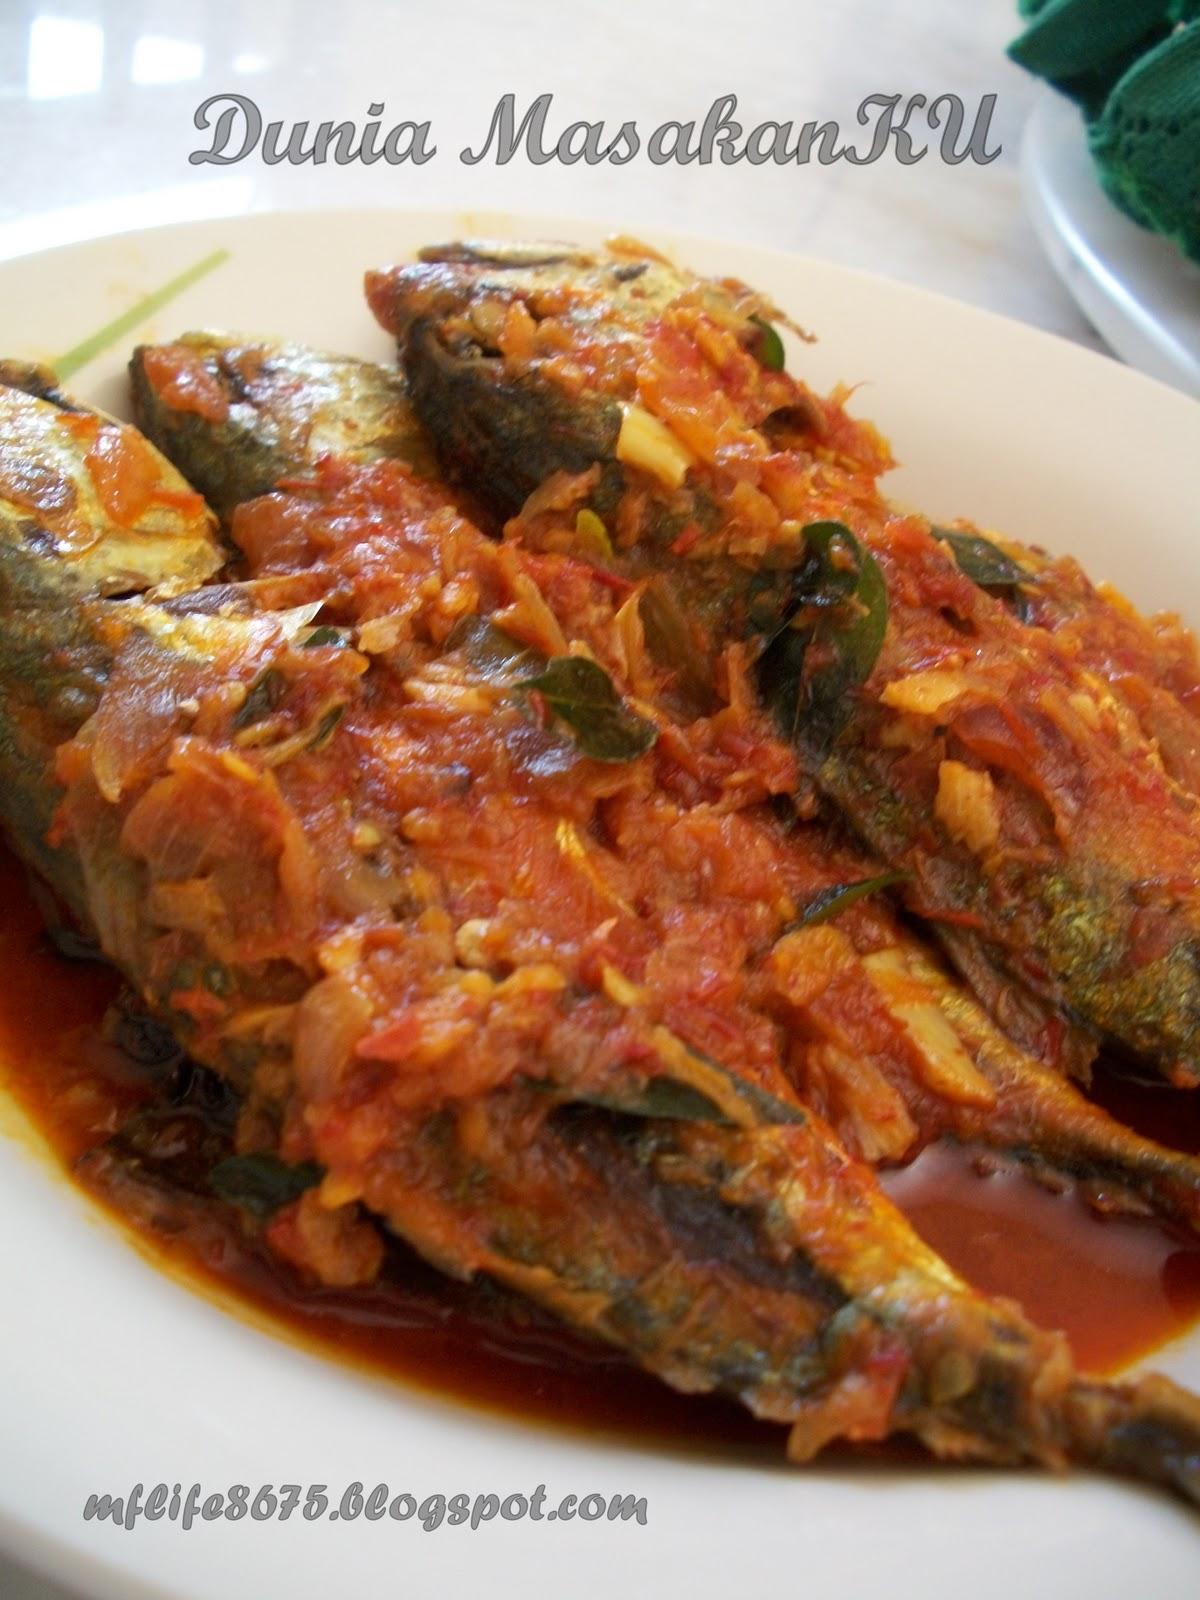 dunia masakanku ikan kembung masak sambal Resepi Ikan Kembung Masak Sambal Serai Enak dan Mudah